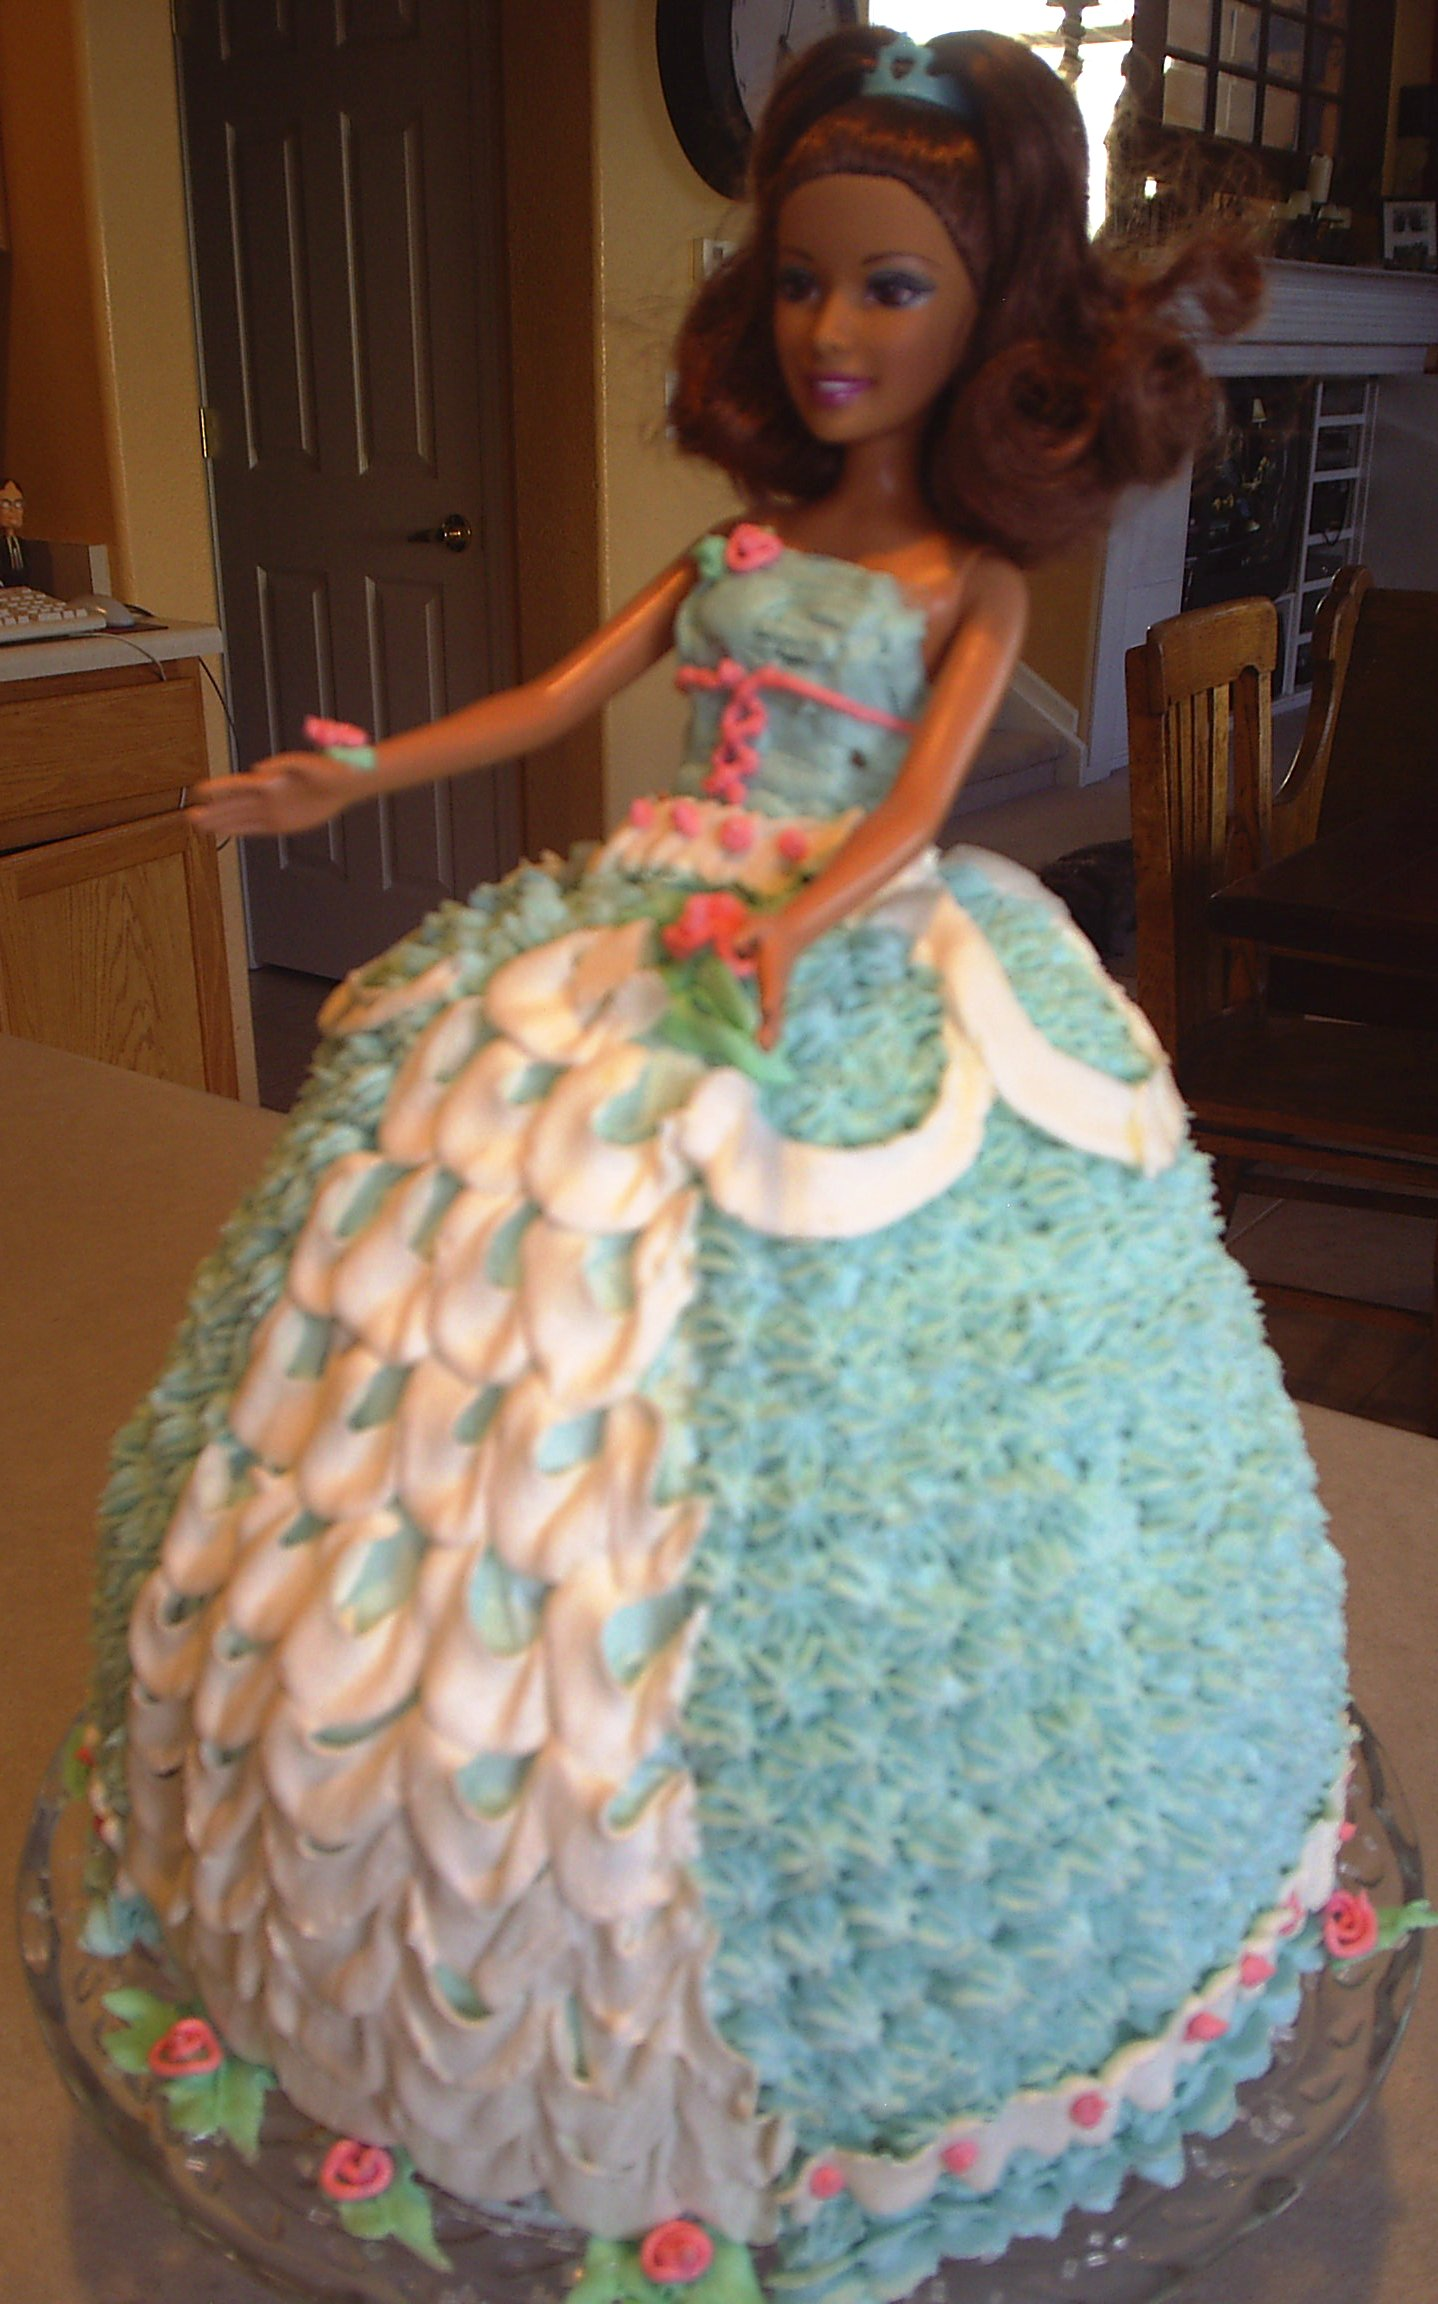 barbie-cake-8.JPG